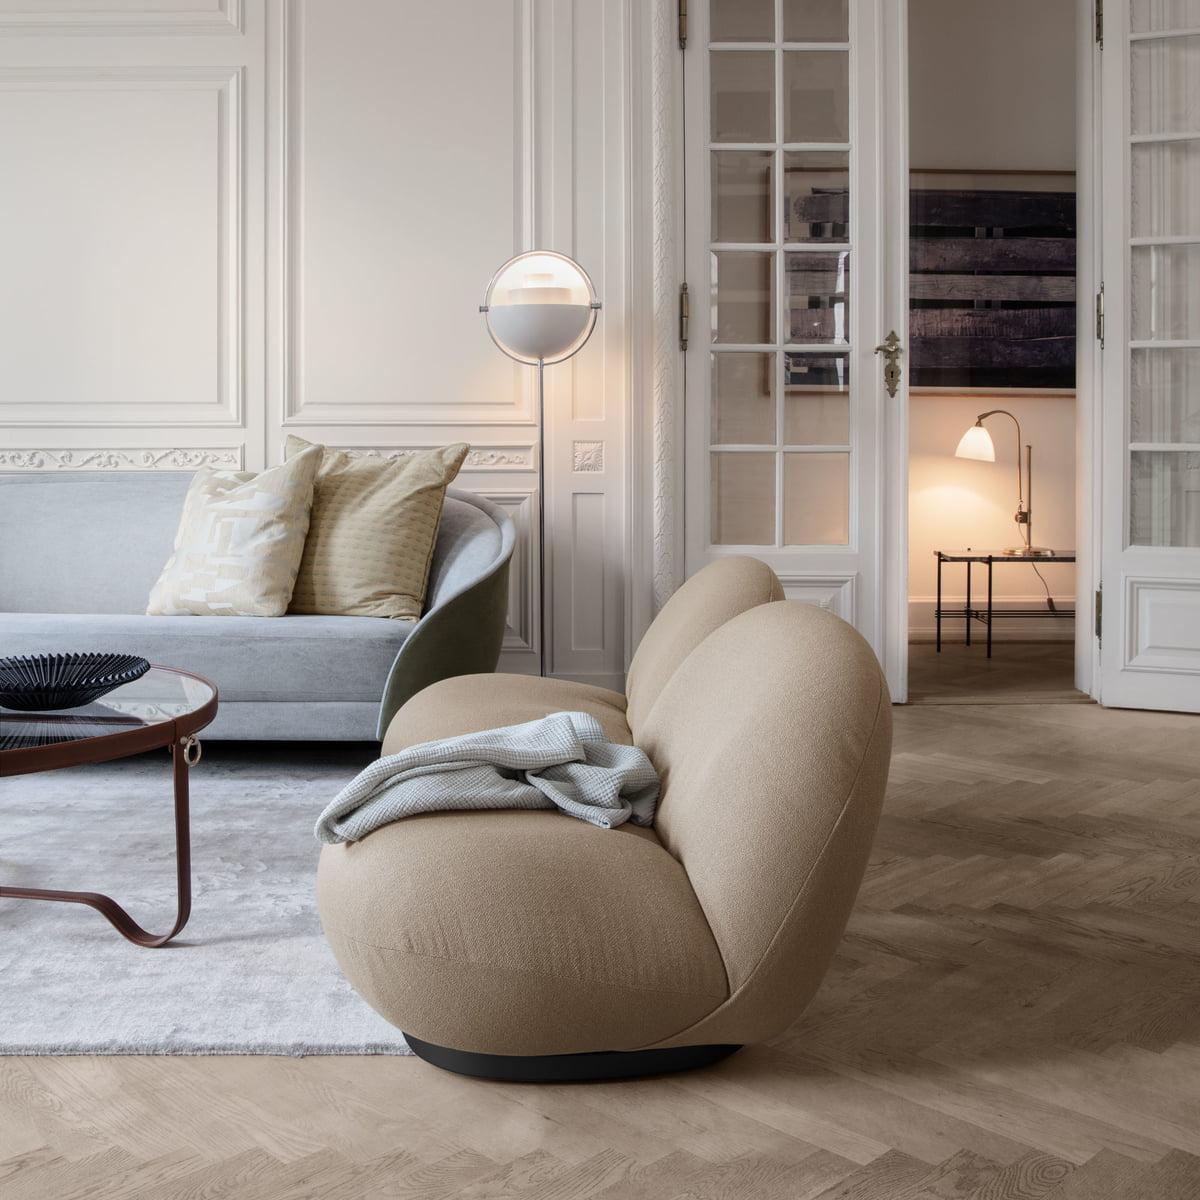 Pacha Lounge Chair Gubi.Pacha Lounge Chair 1000 Chairs